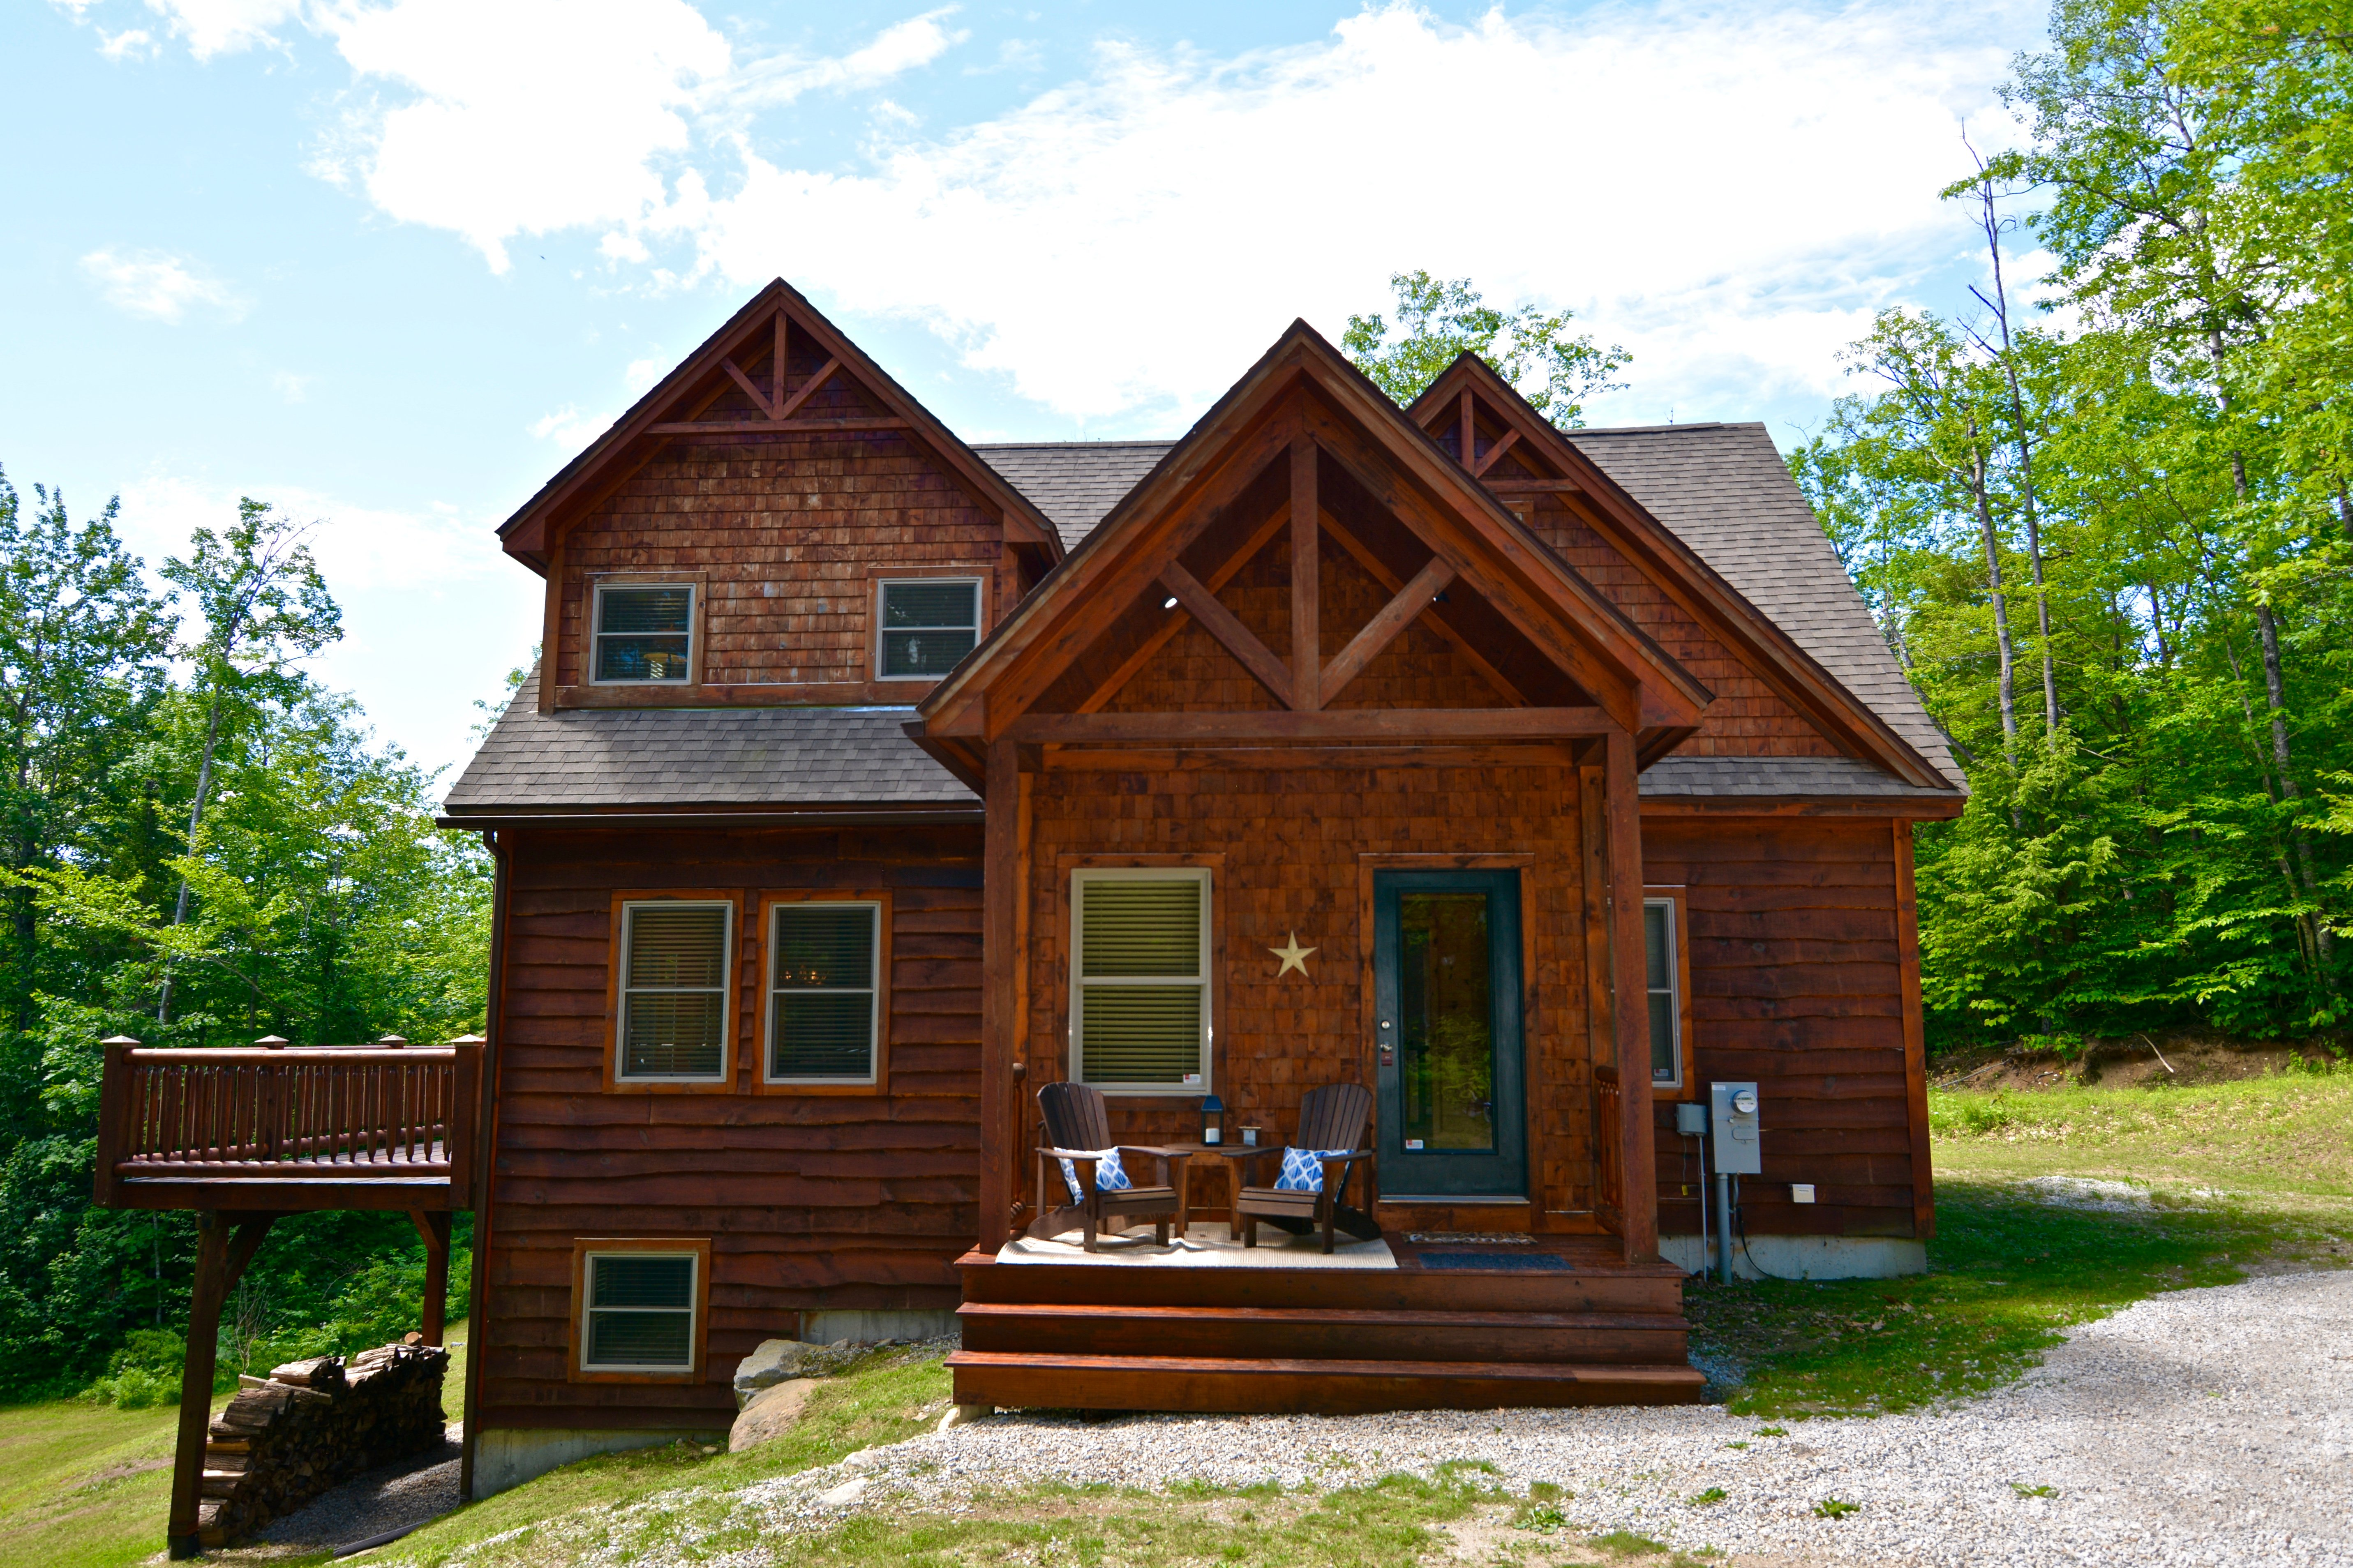 Home with live edge siding and cedar shingles